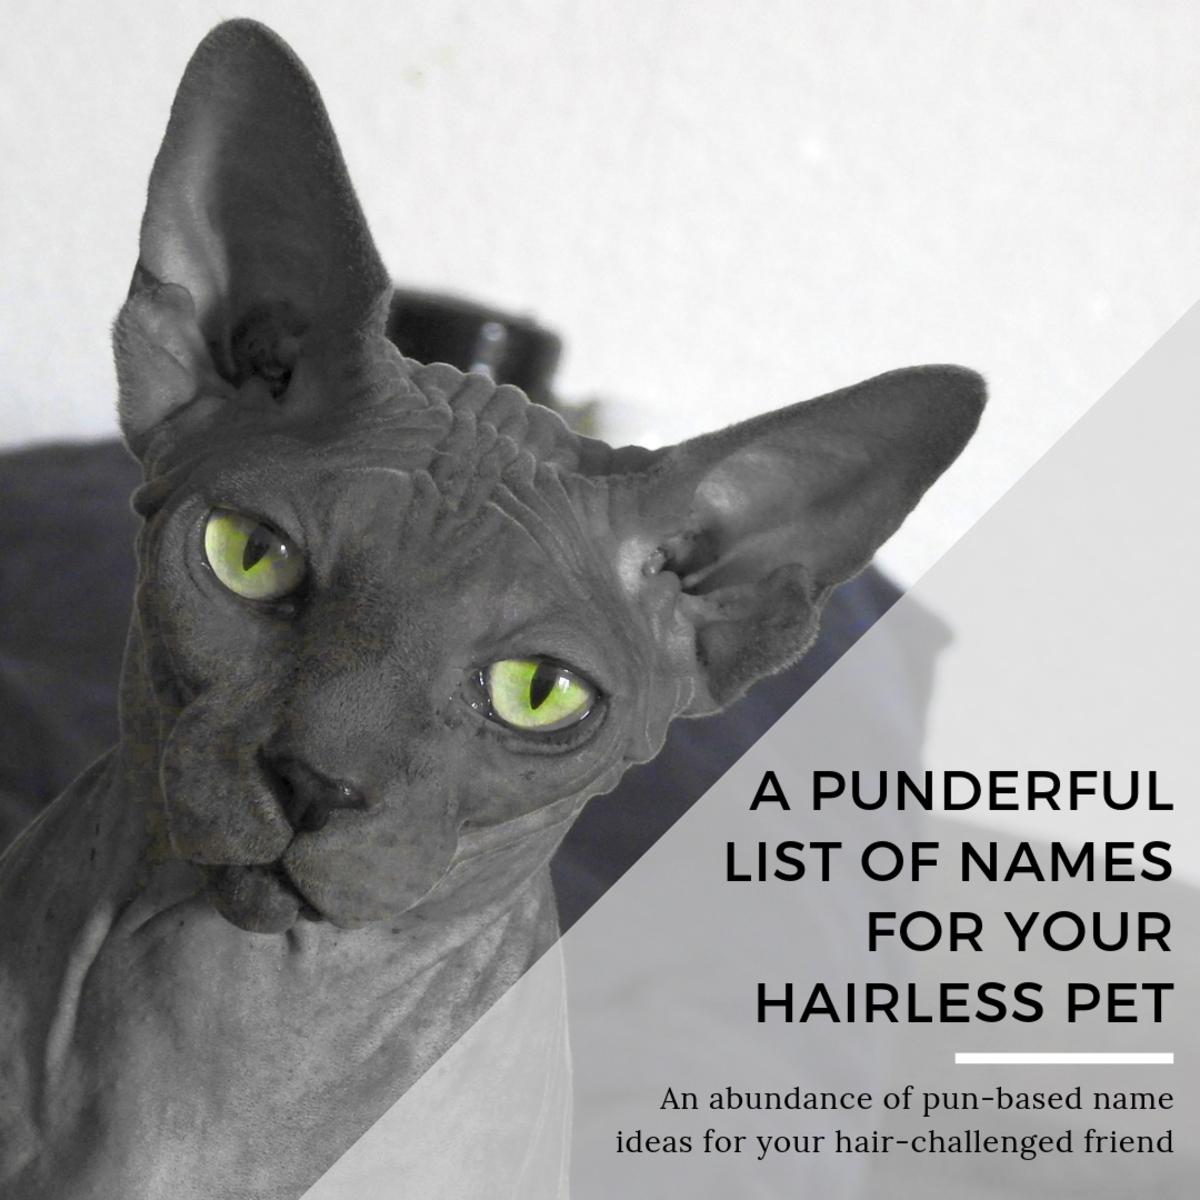 45+ Punderful Hairless Cat Names